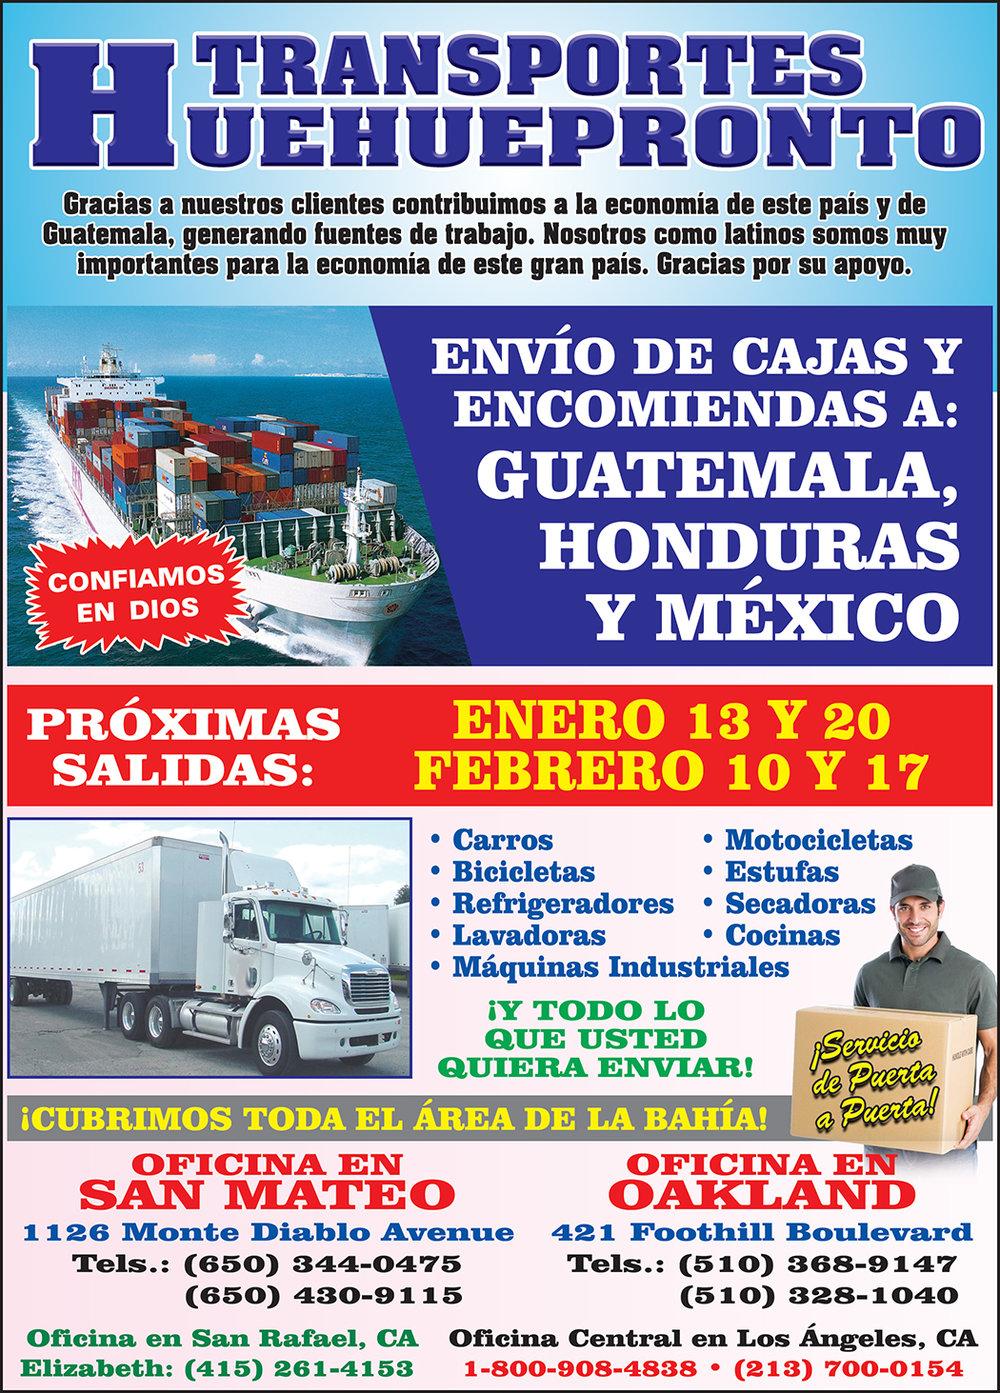 Transportes Huehuepronto 1pag - ENERO 2019.jpg